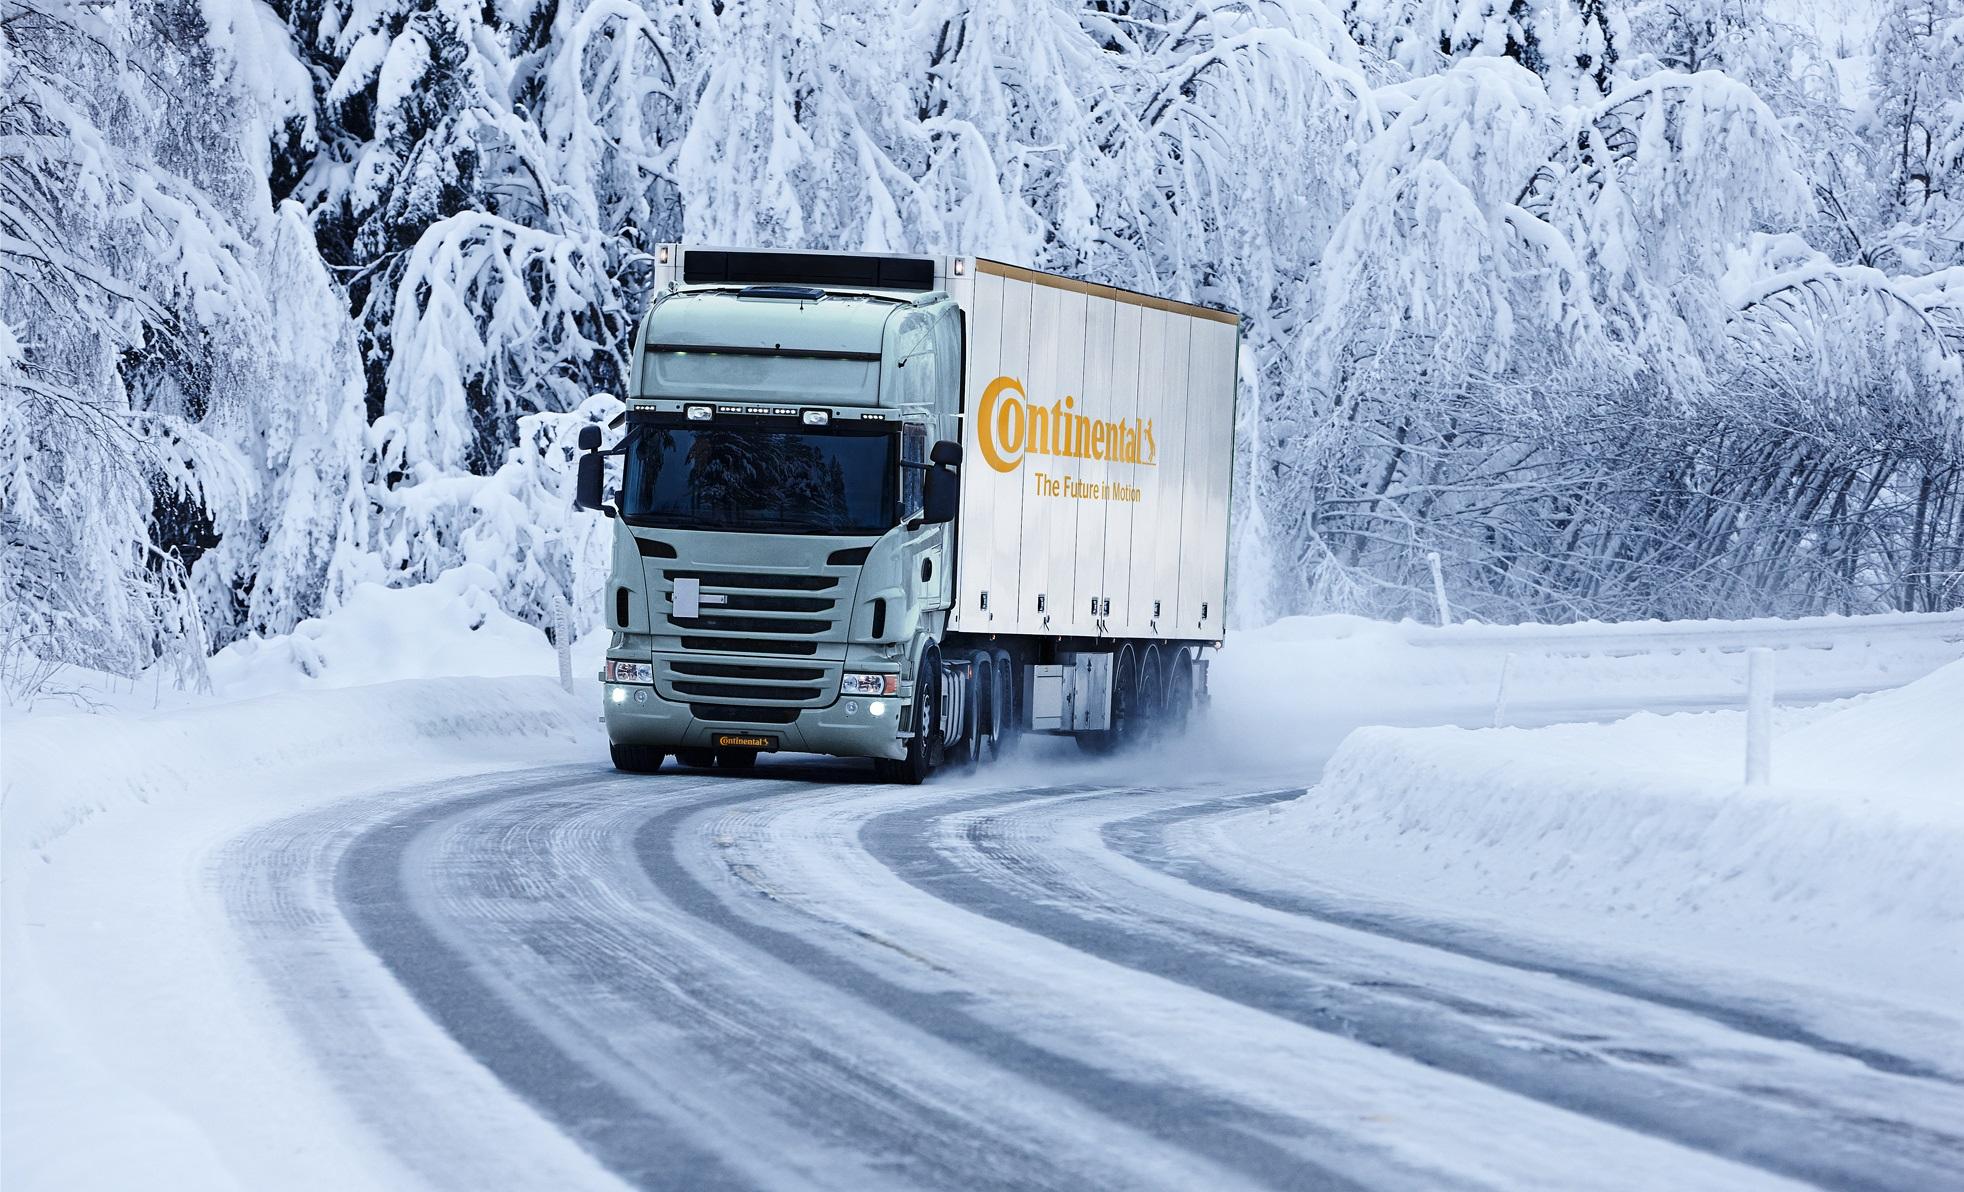 Car Winter Accessories Uk